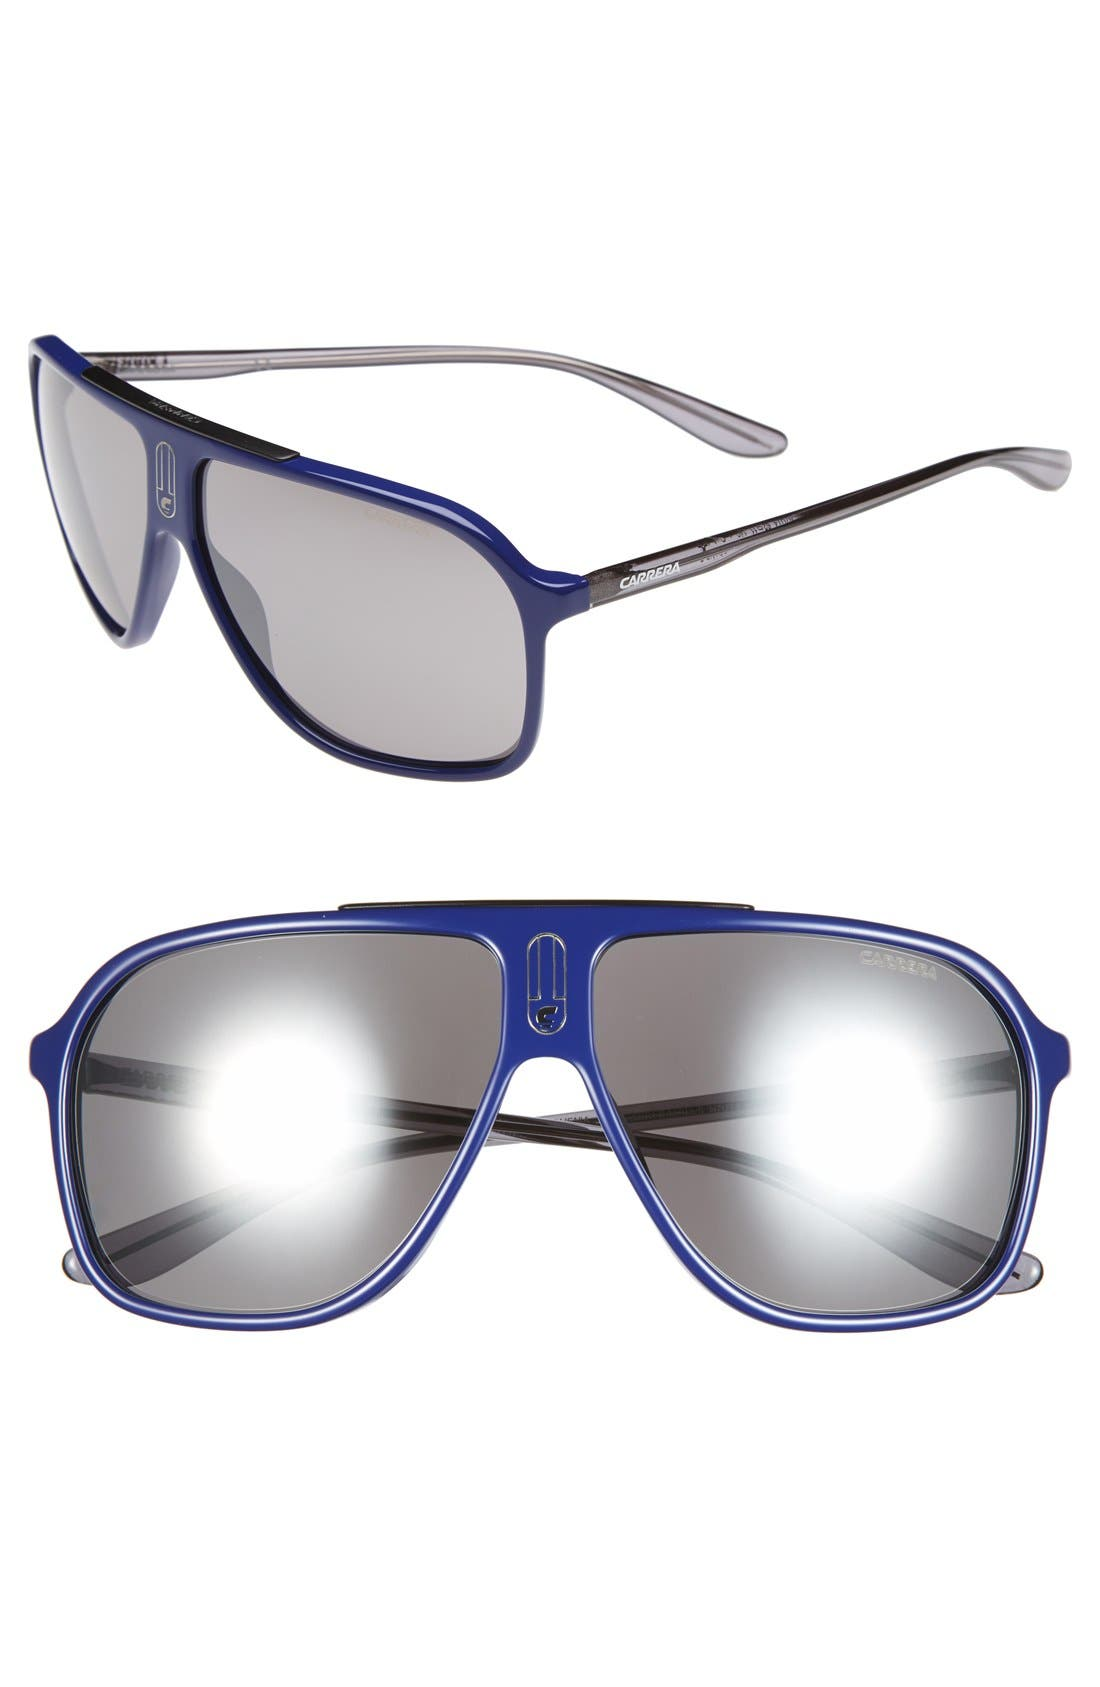 62mm Sunglasses,                             Main thumbnail 1, color,                             Blue Grey/ Black Mirror